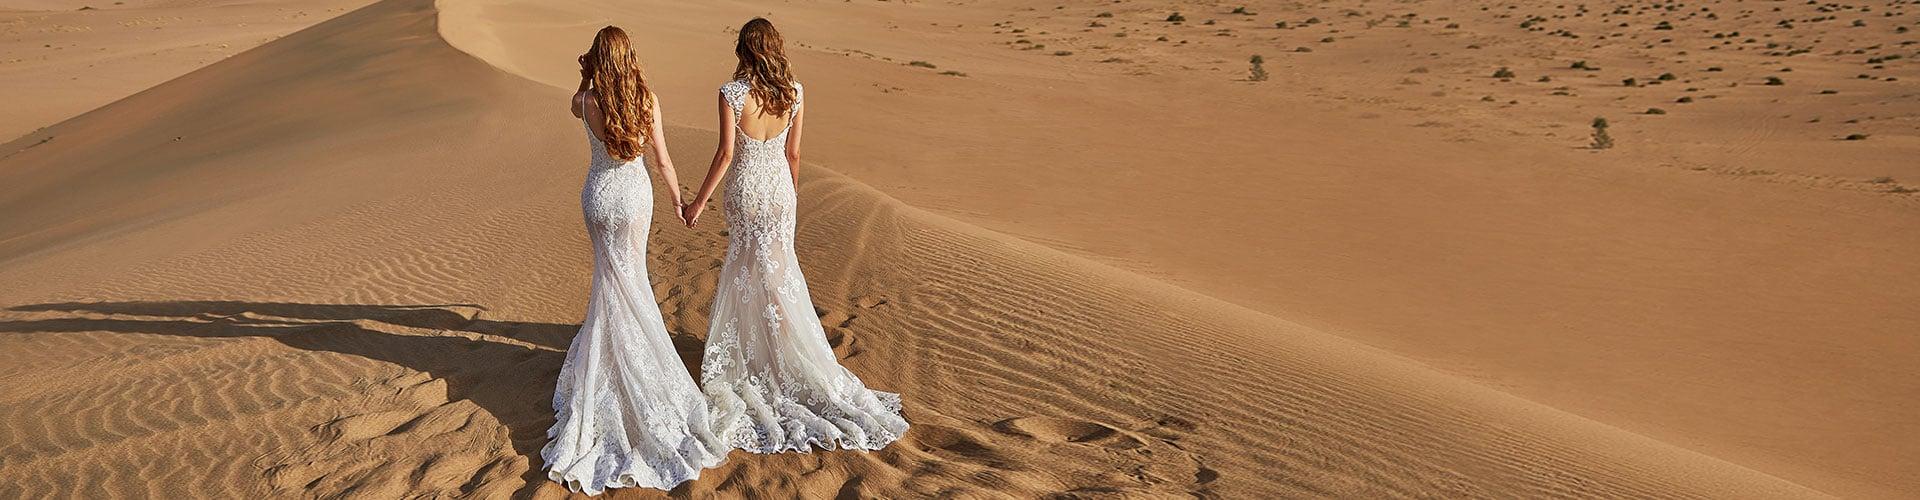 Amazing Designer Wedding Dresses at Affordable Price